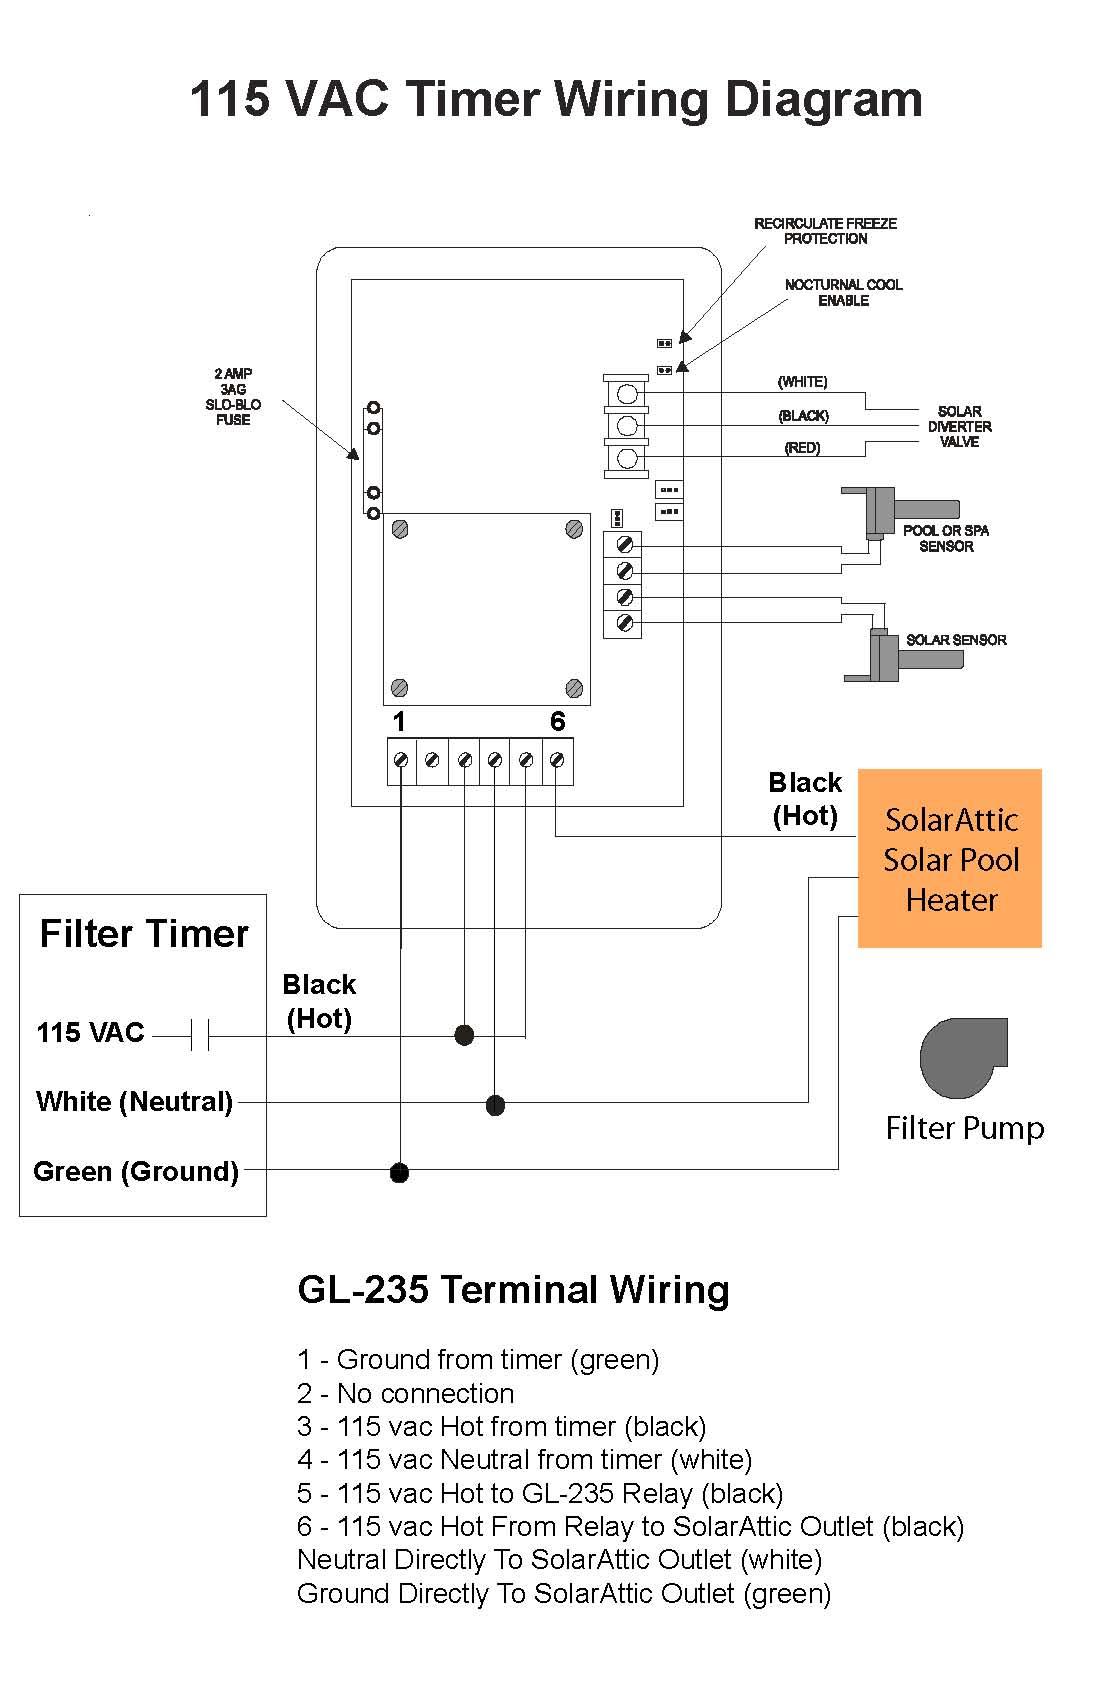 115V_timer_wiring_diagram pool timer wiring diagram dolgular com pe153 intermatic 2 pump wiring diagram at nearapp.co